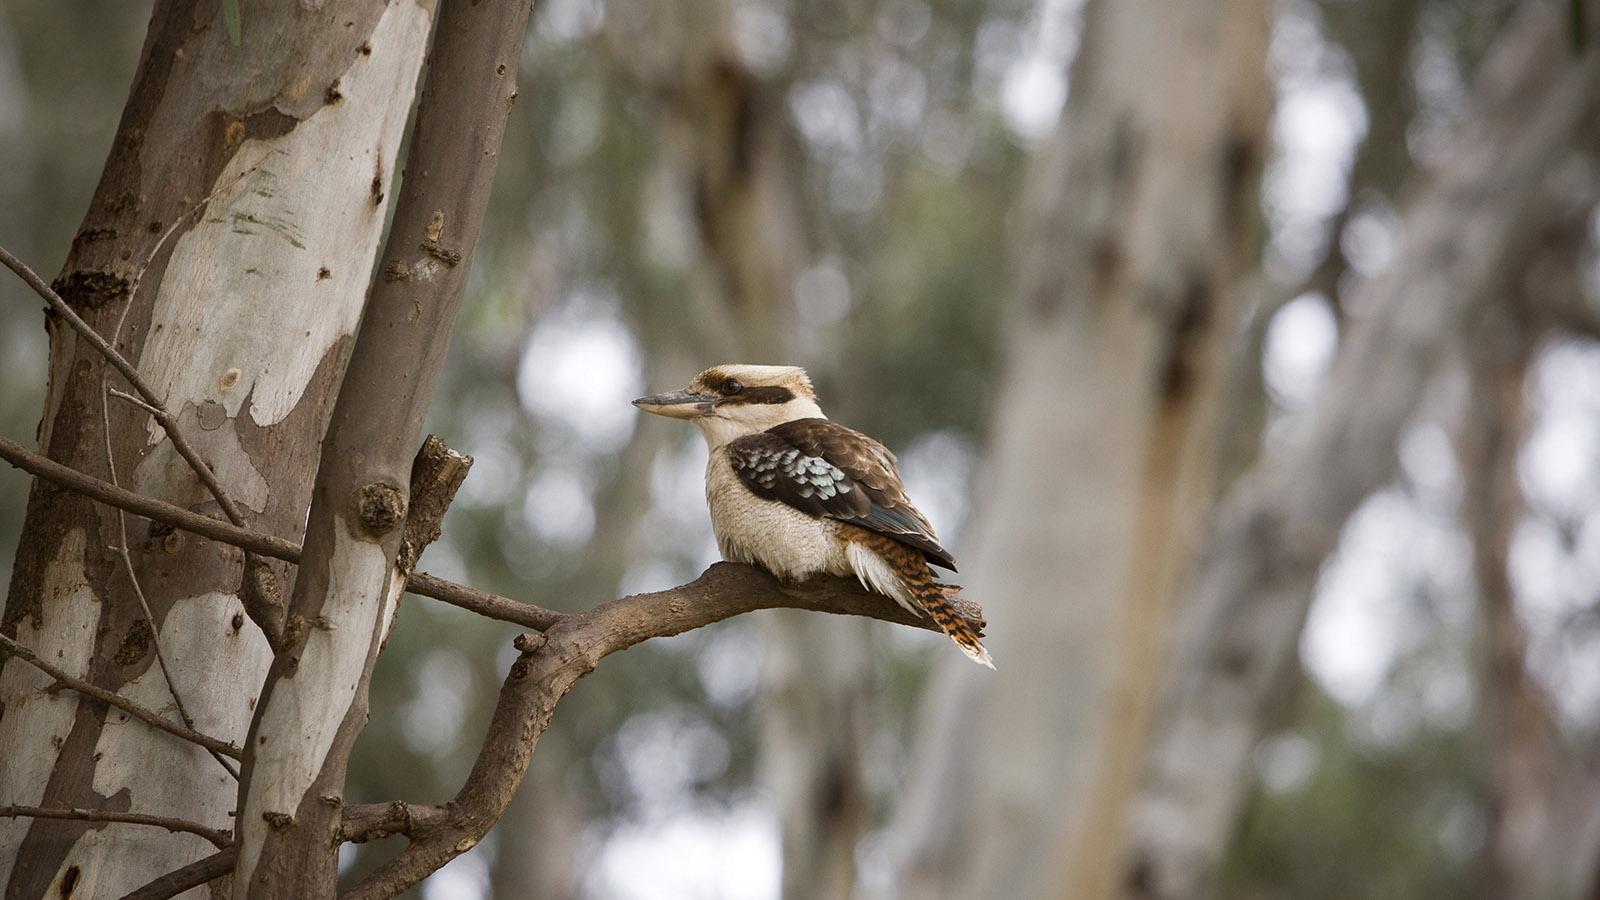 Kookaburra, The Murray, Victoria, Australia